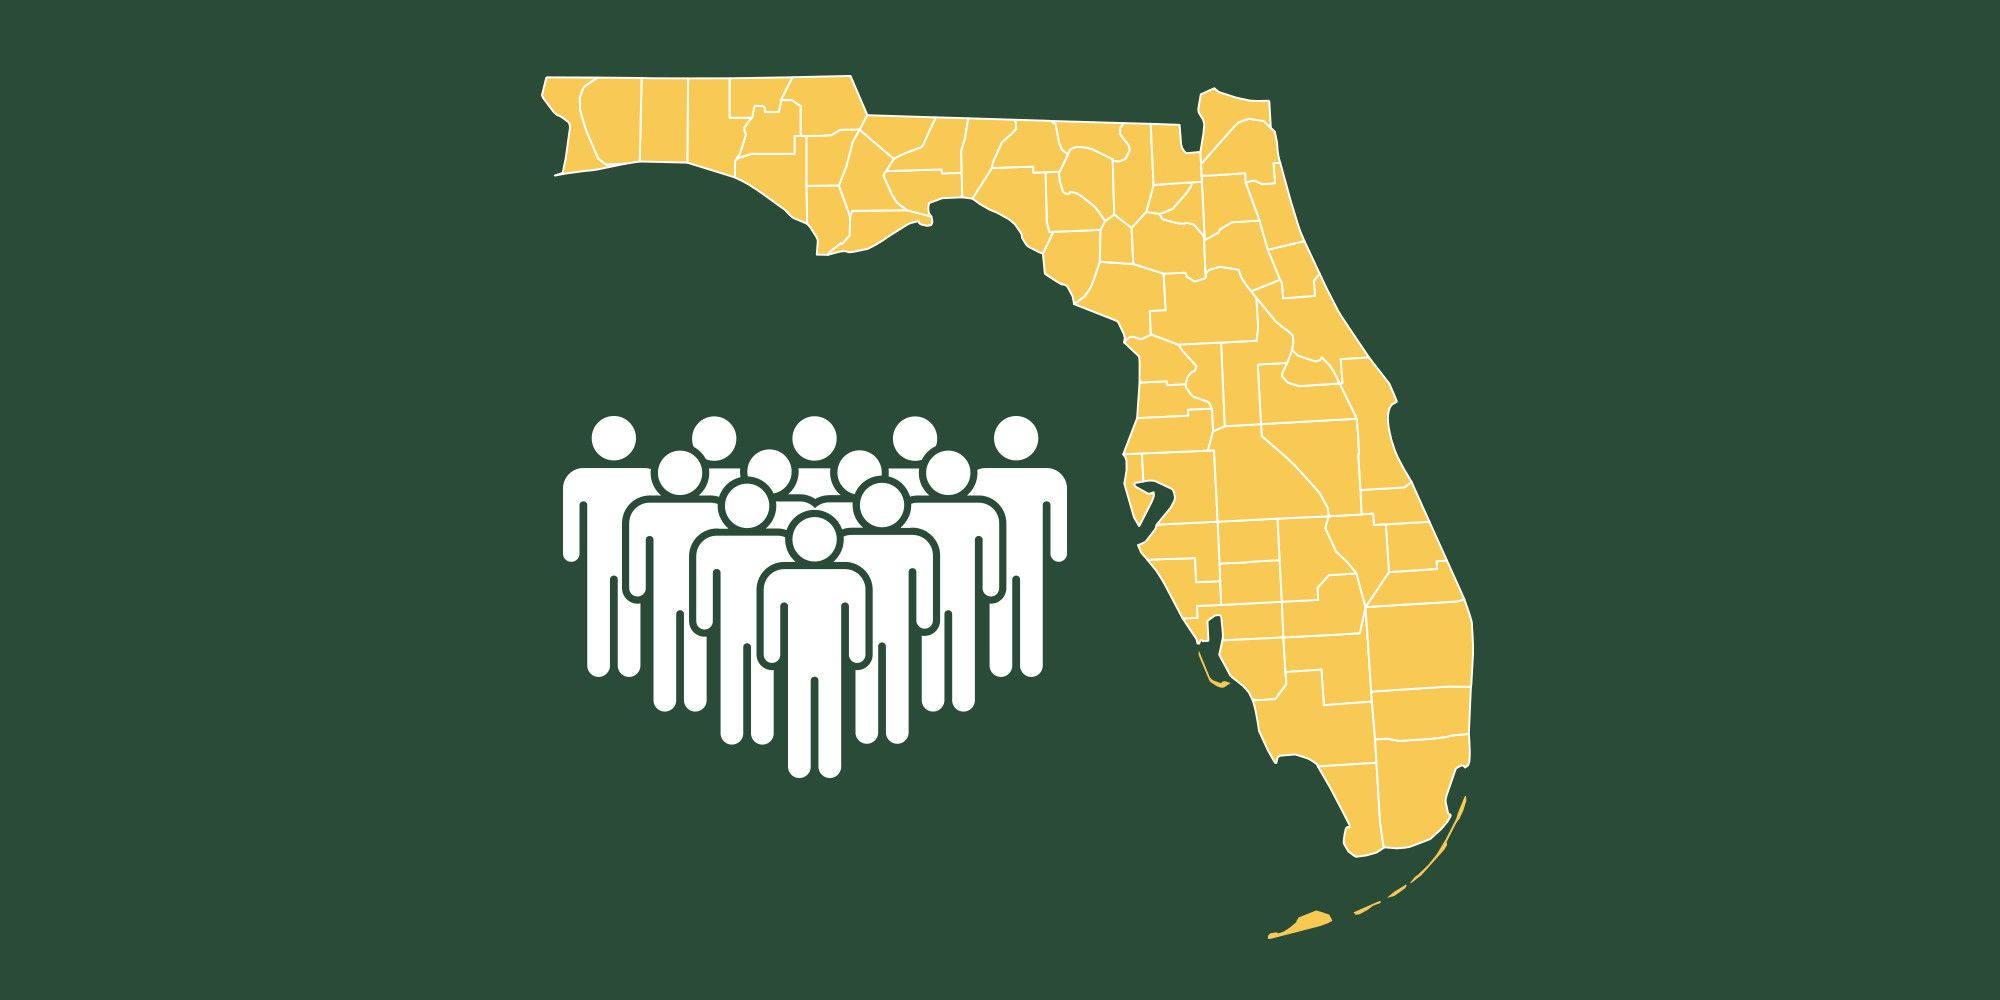 Florida man november 17 2004